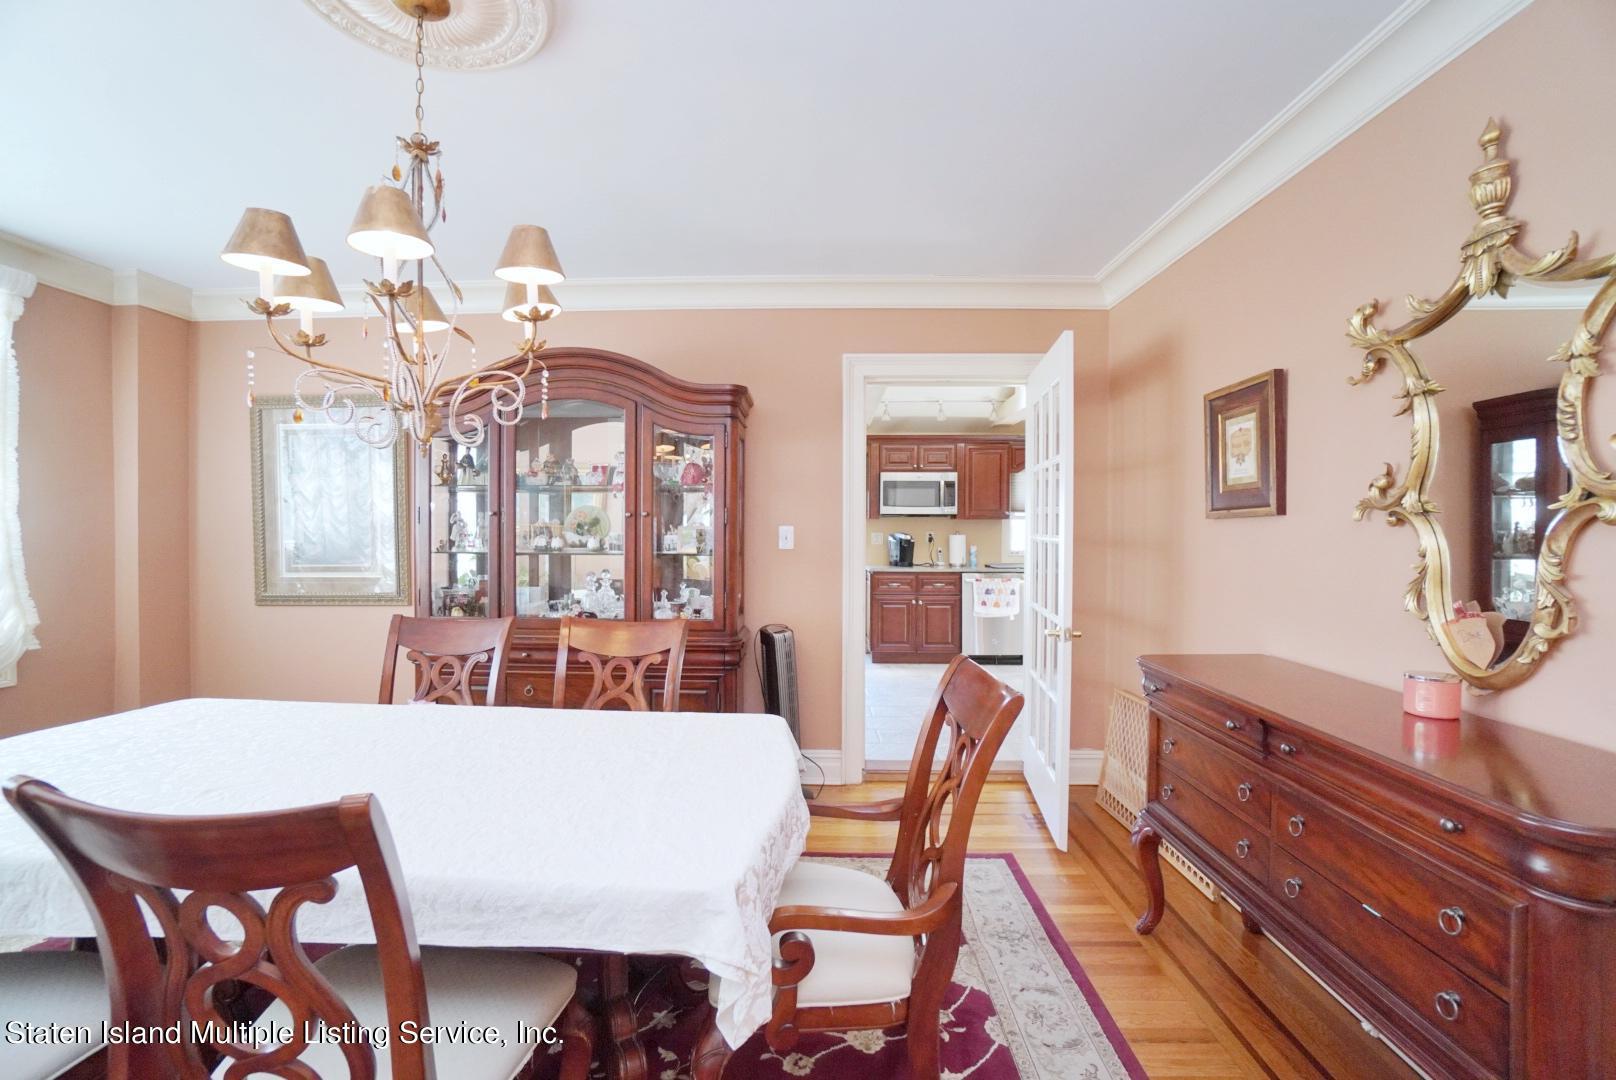 Single Family - Detached 264 Fisher Avenue  Staten Island, NY 10307, MLS-1146898-15